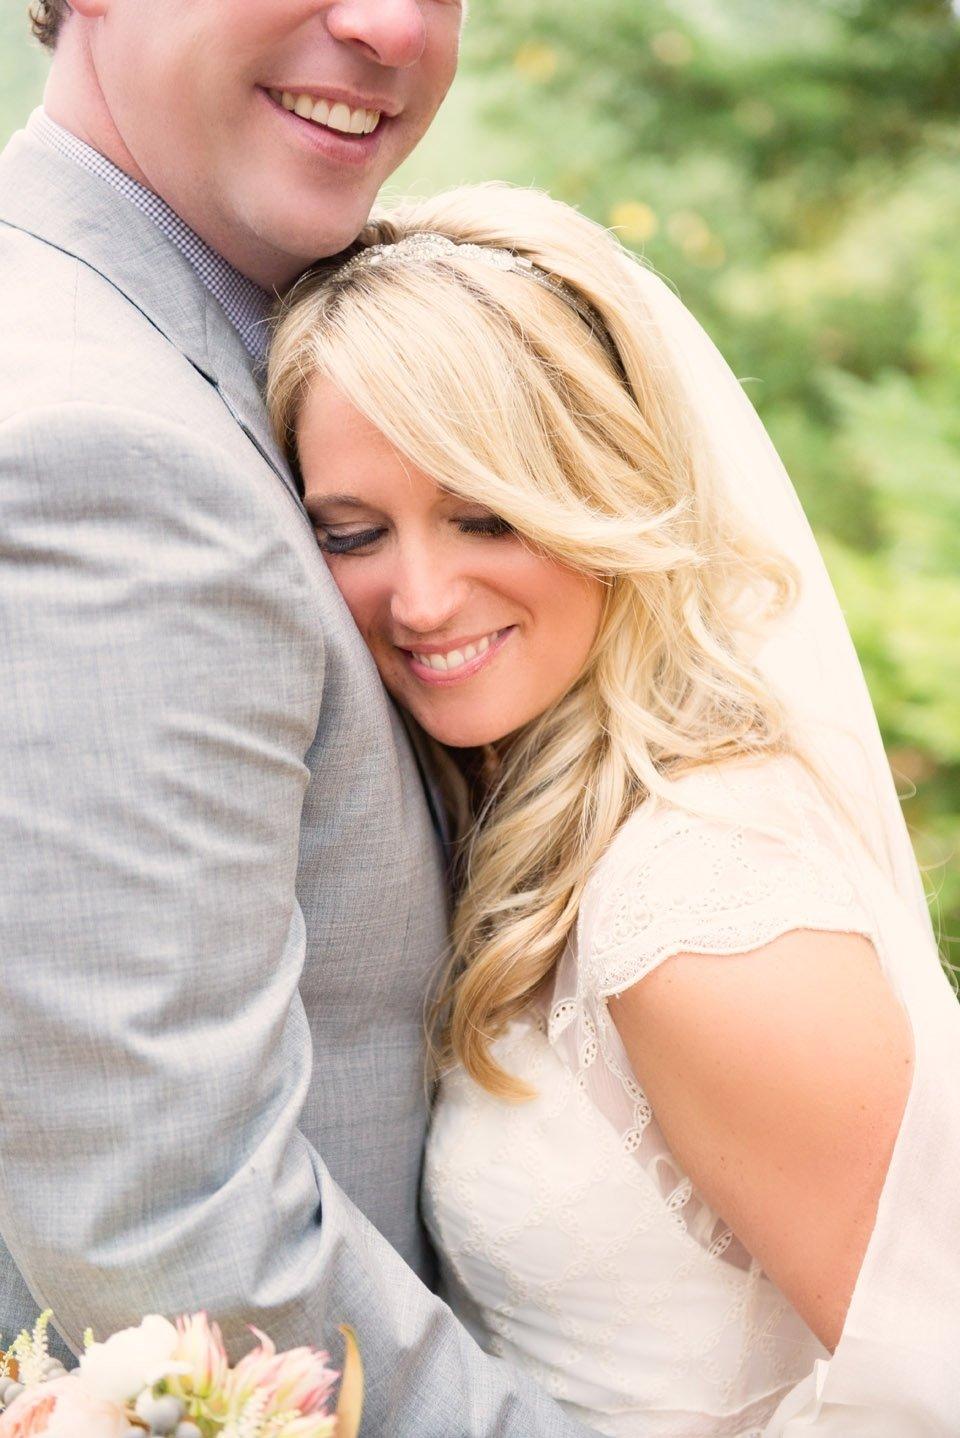 10 Fabulous Wedding Photo Ideas Bride And Groom northern michigan wedding photographers engagements portraits 2020